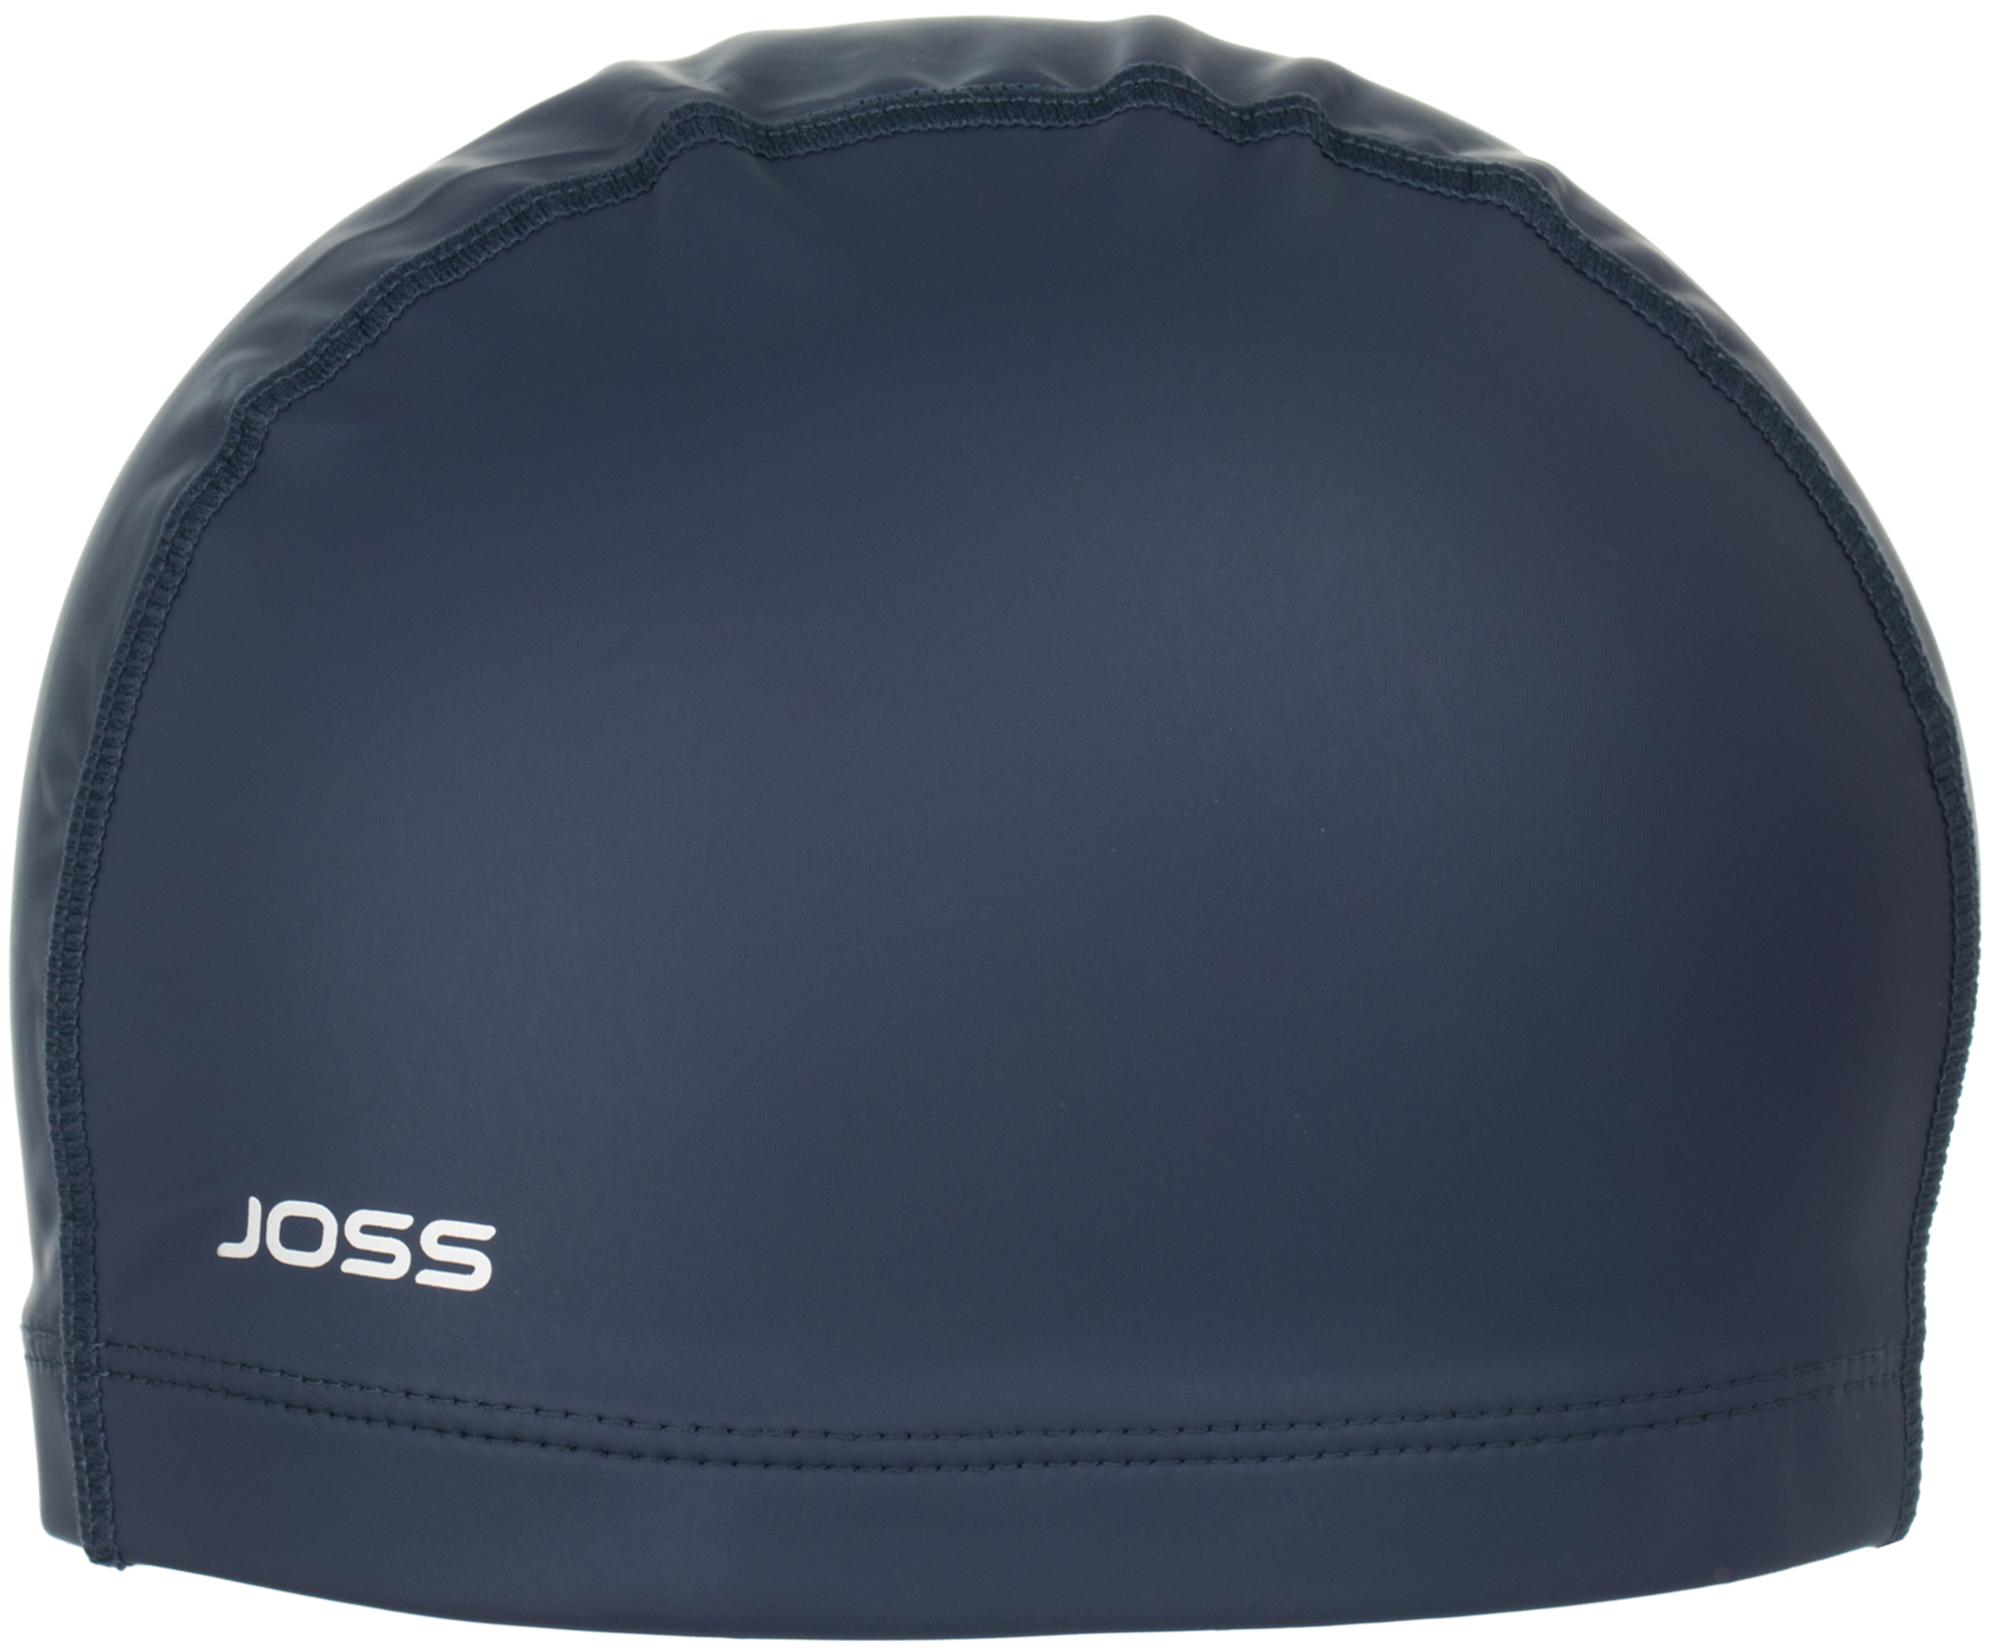 матрасы для плавания Joss Шапочка для плавания Joss